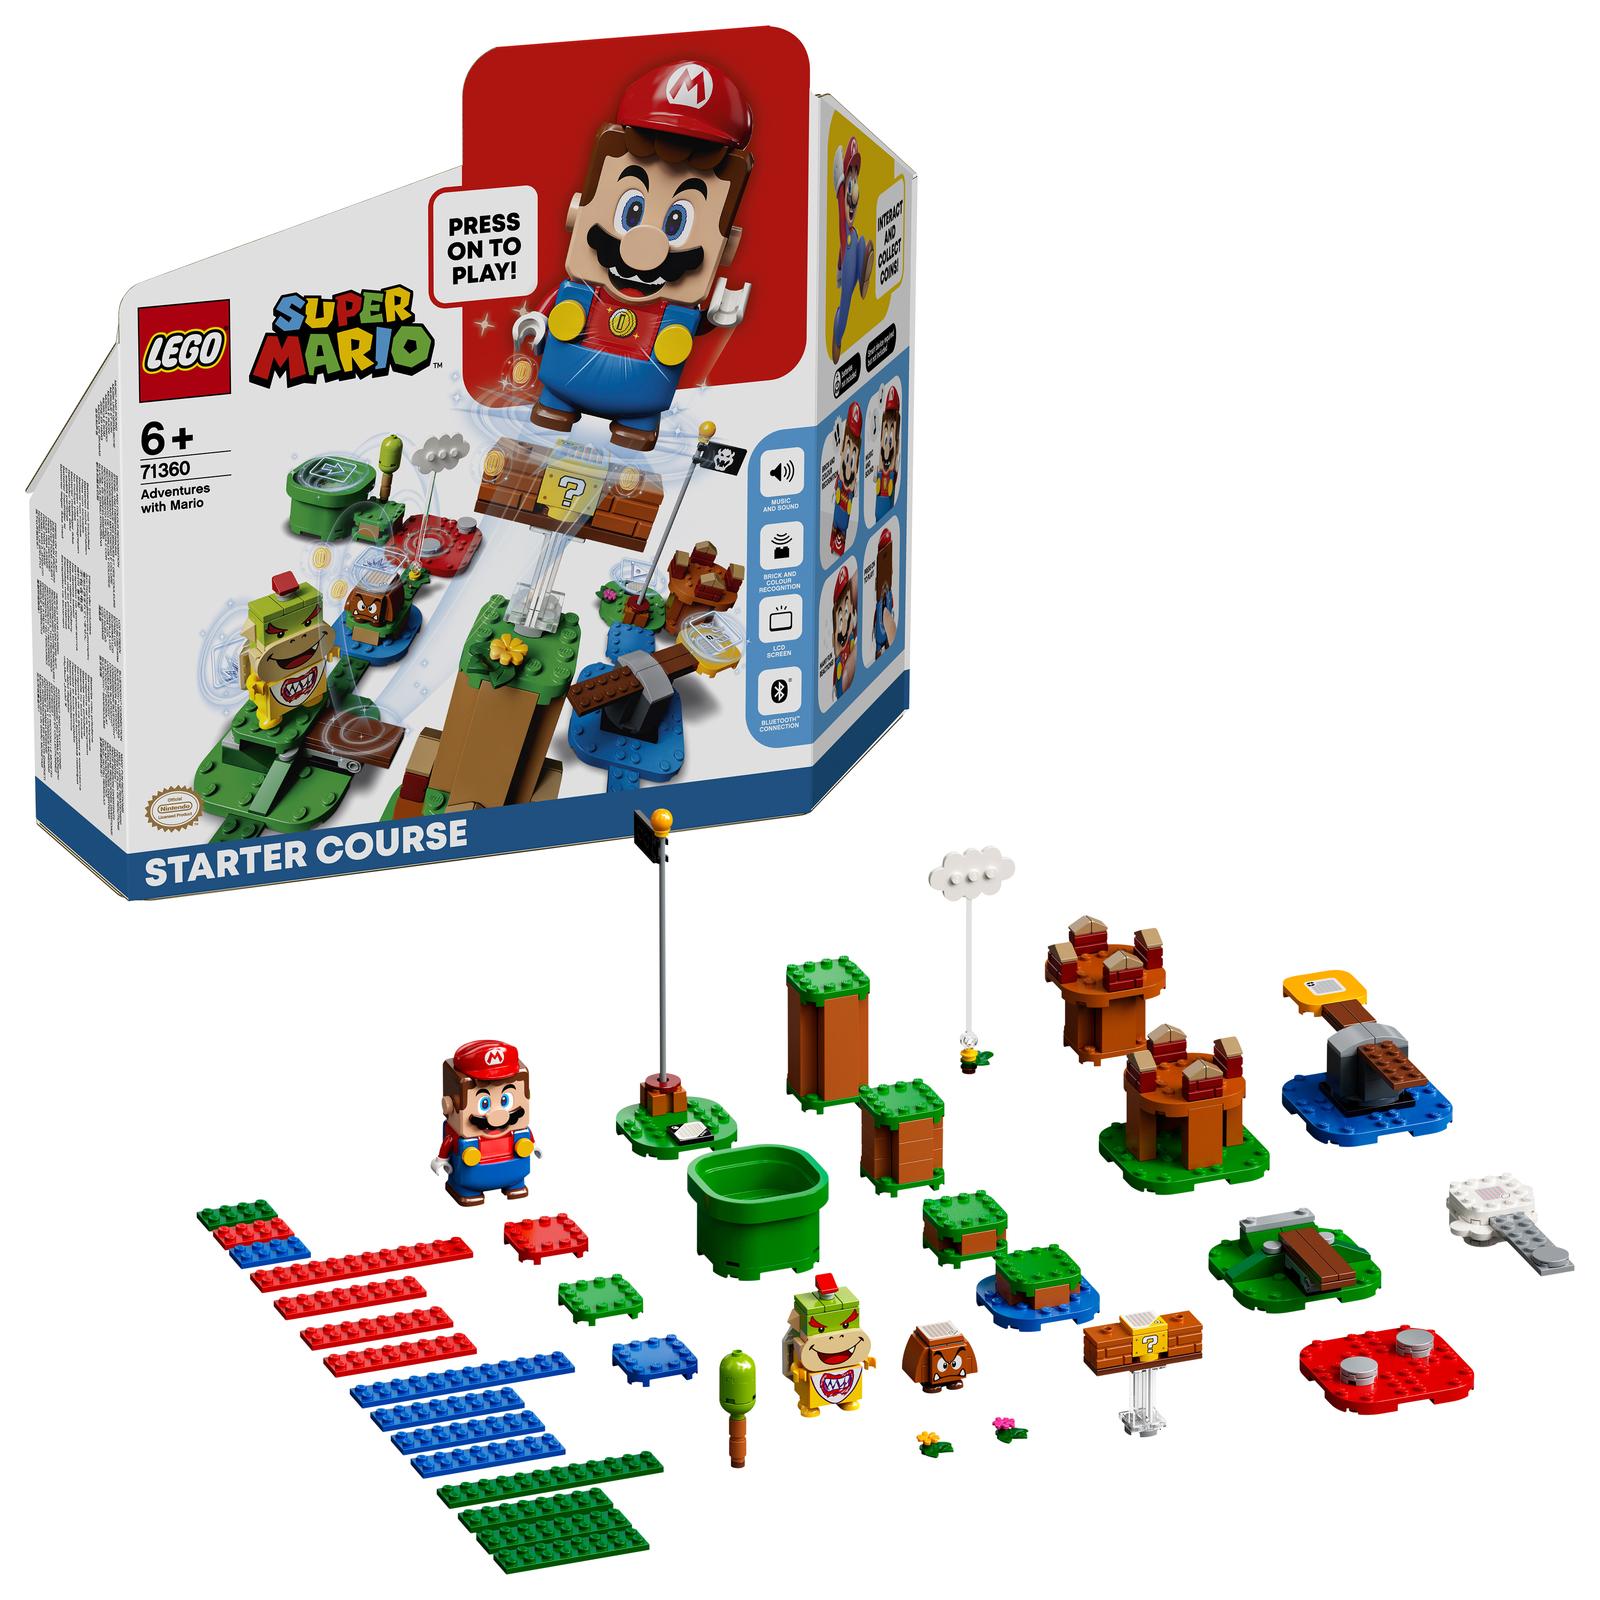 LEGO Super Mario: Adventures with Mario - Starter Course (71360) image